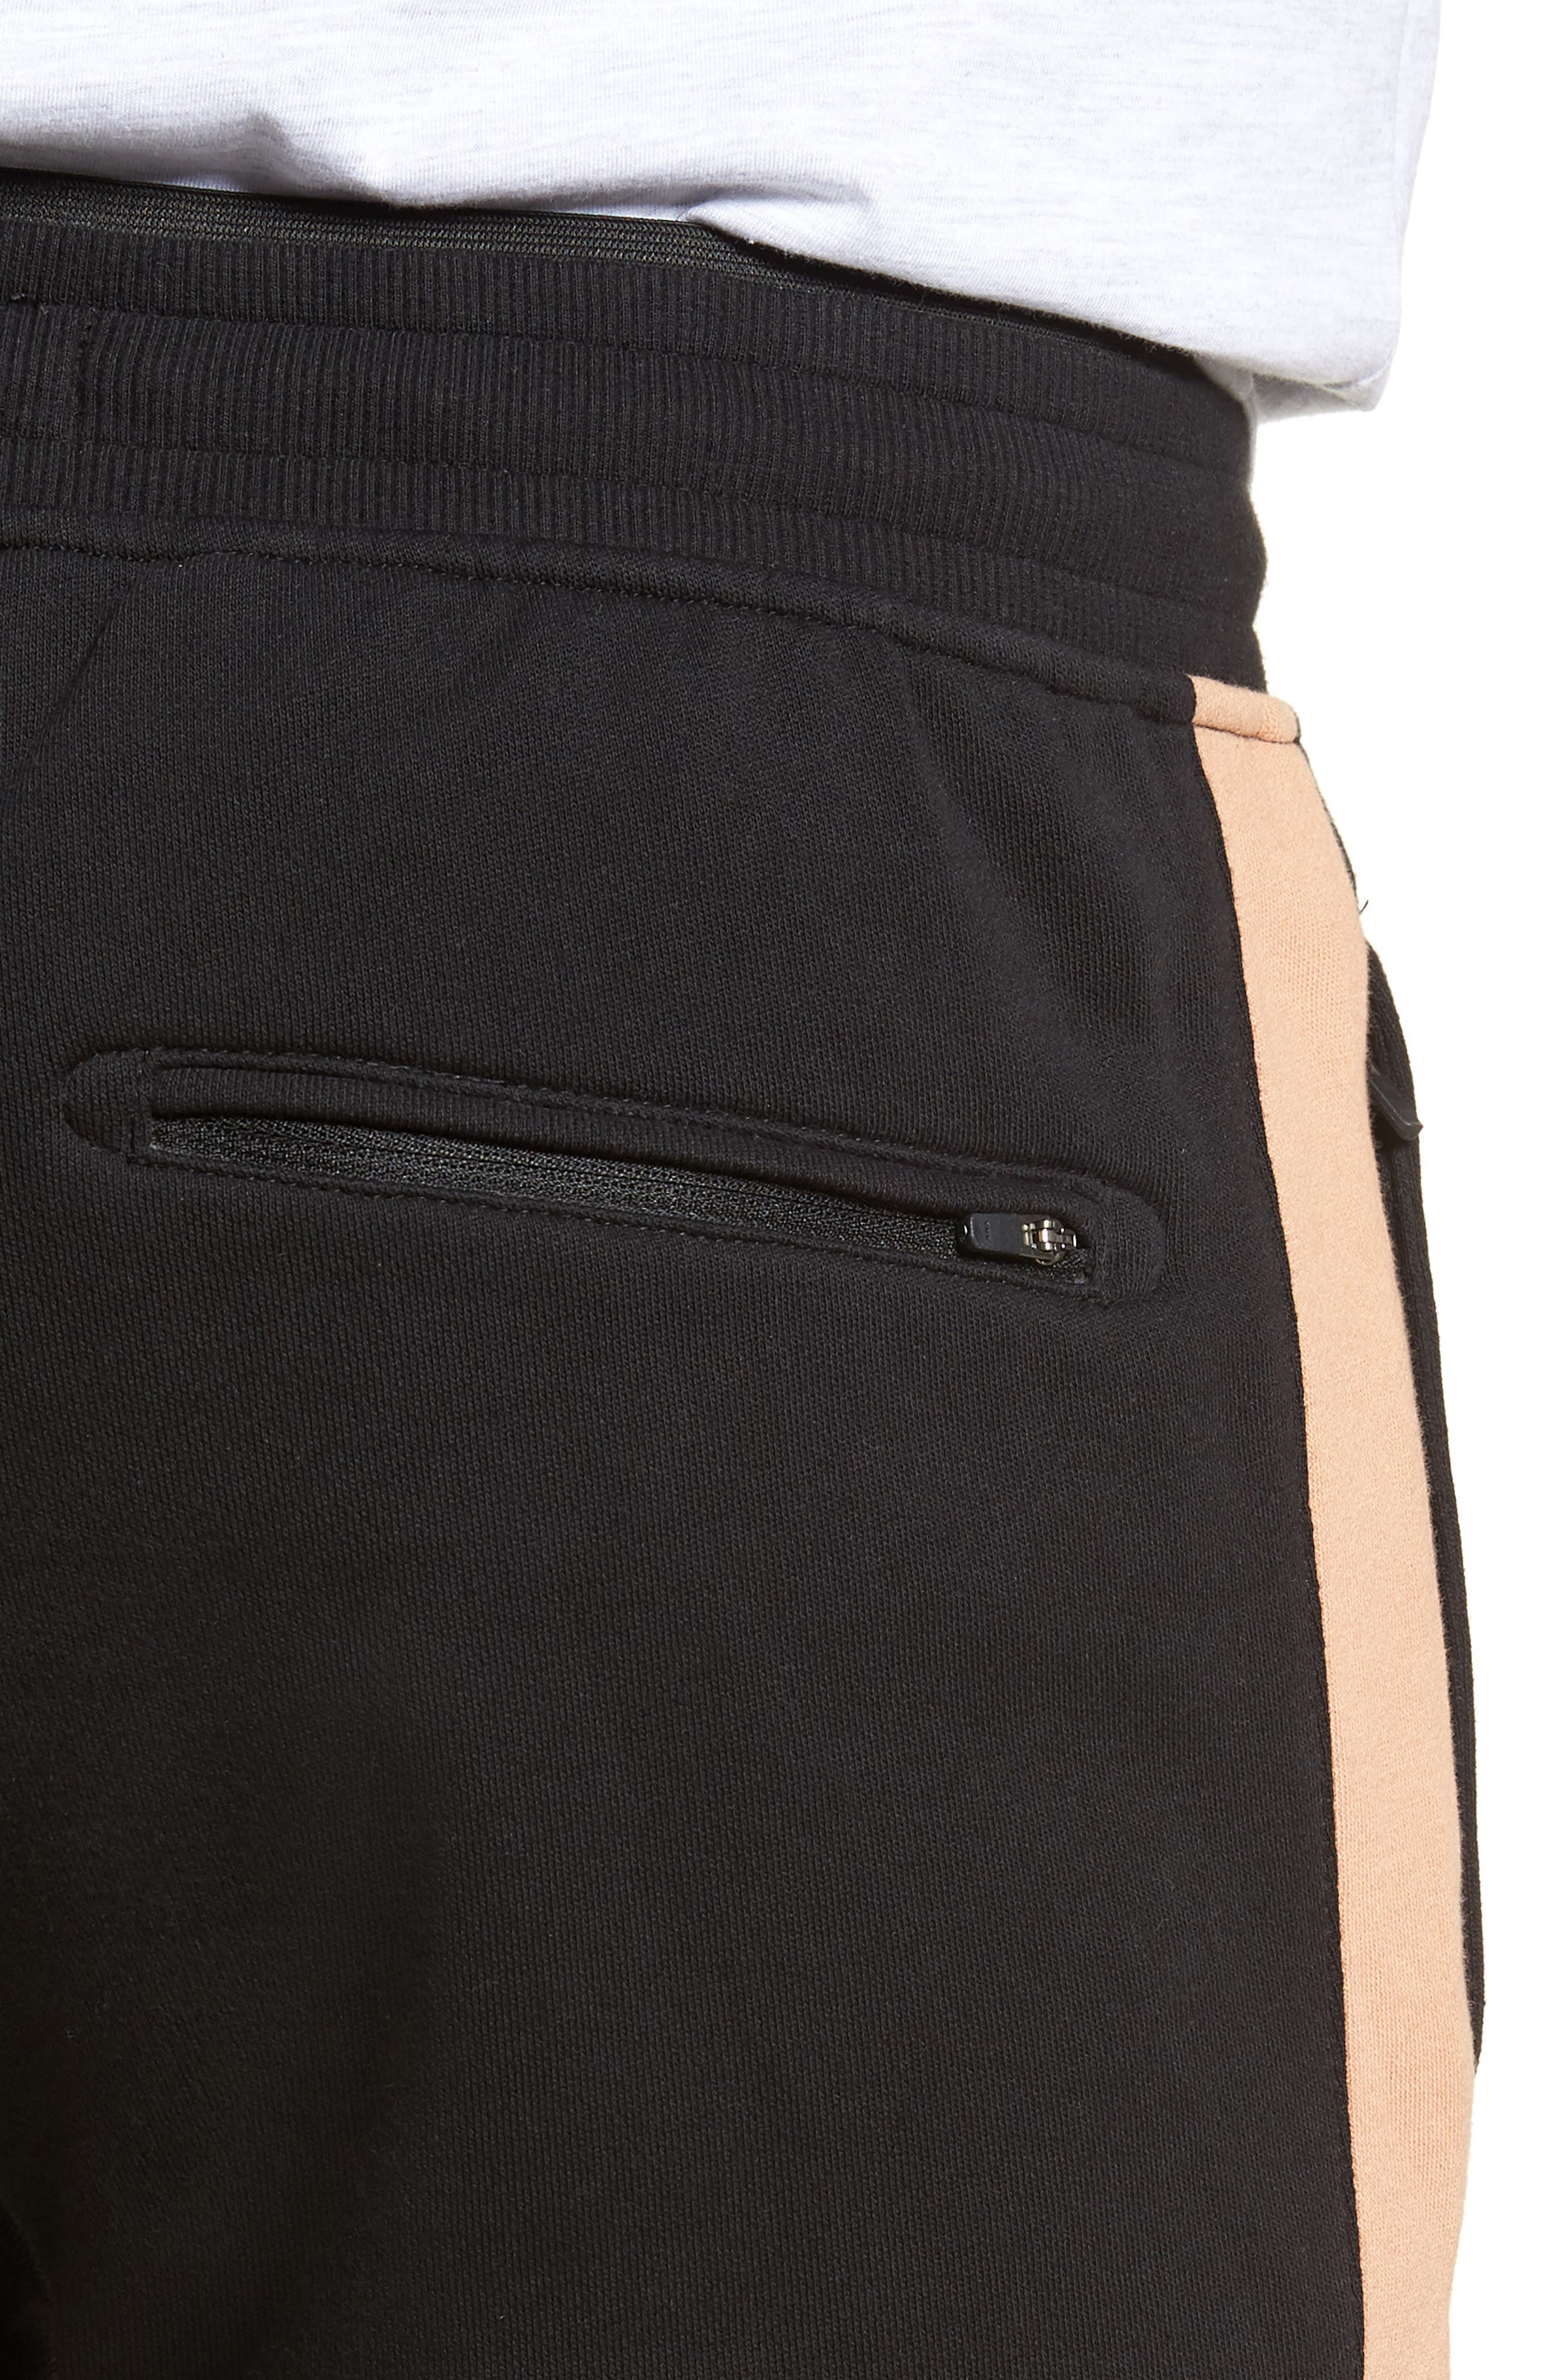 Jumpshot Slim Track Pants,                             Alternate thumbnail 4, color,                             BLACK/ BISCUIT